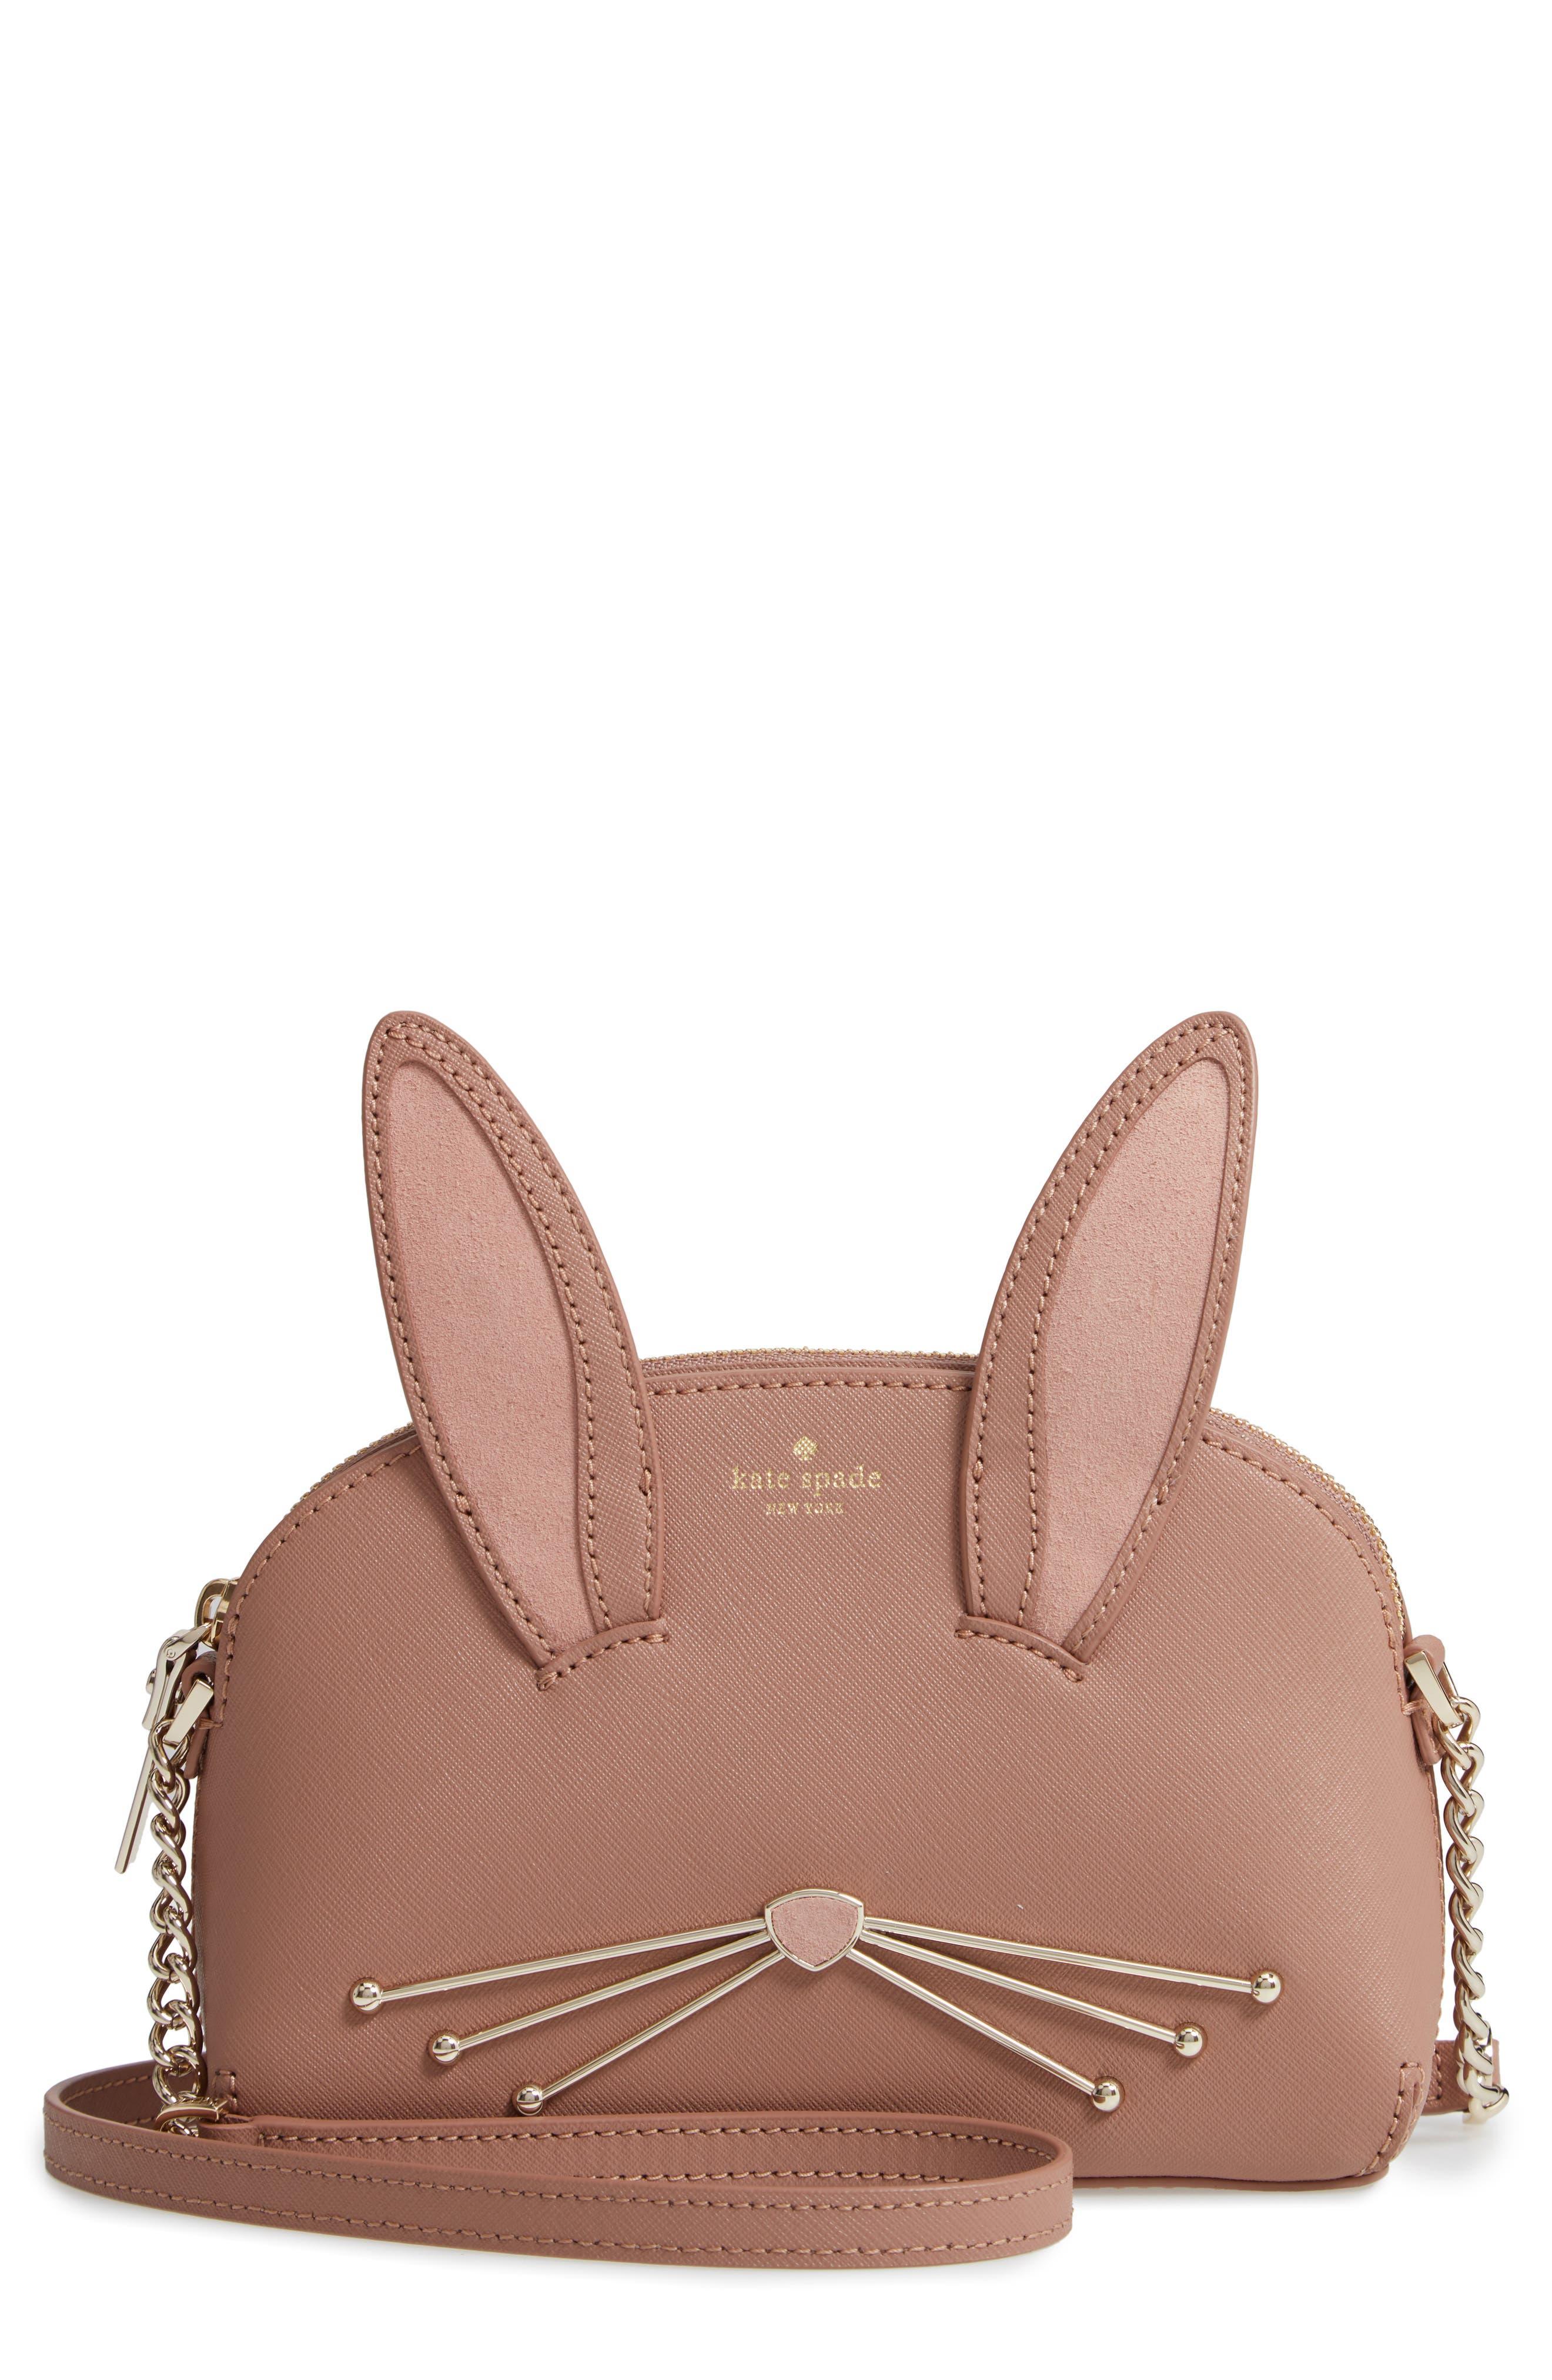 KATE SPADE NEW YORK,                             desert muse rabbit hilli bag,                             Main thumbnail 1, color,                             200